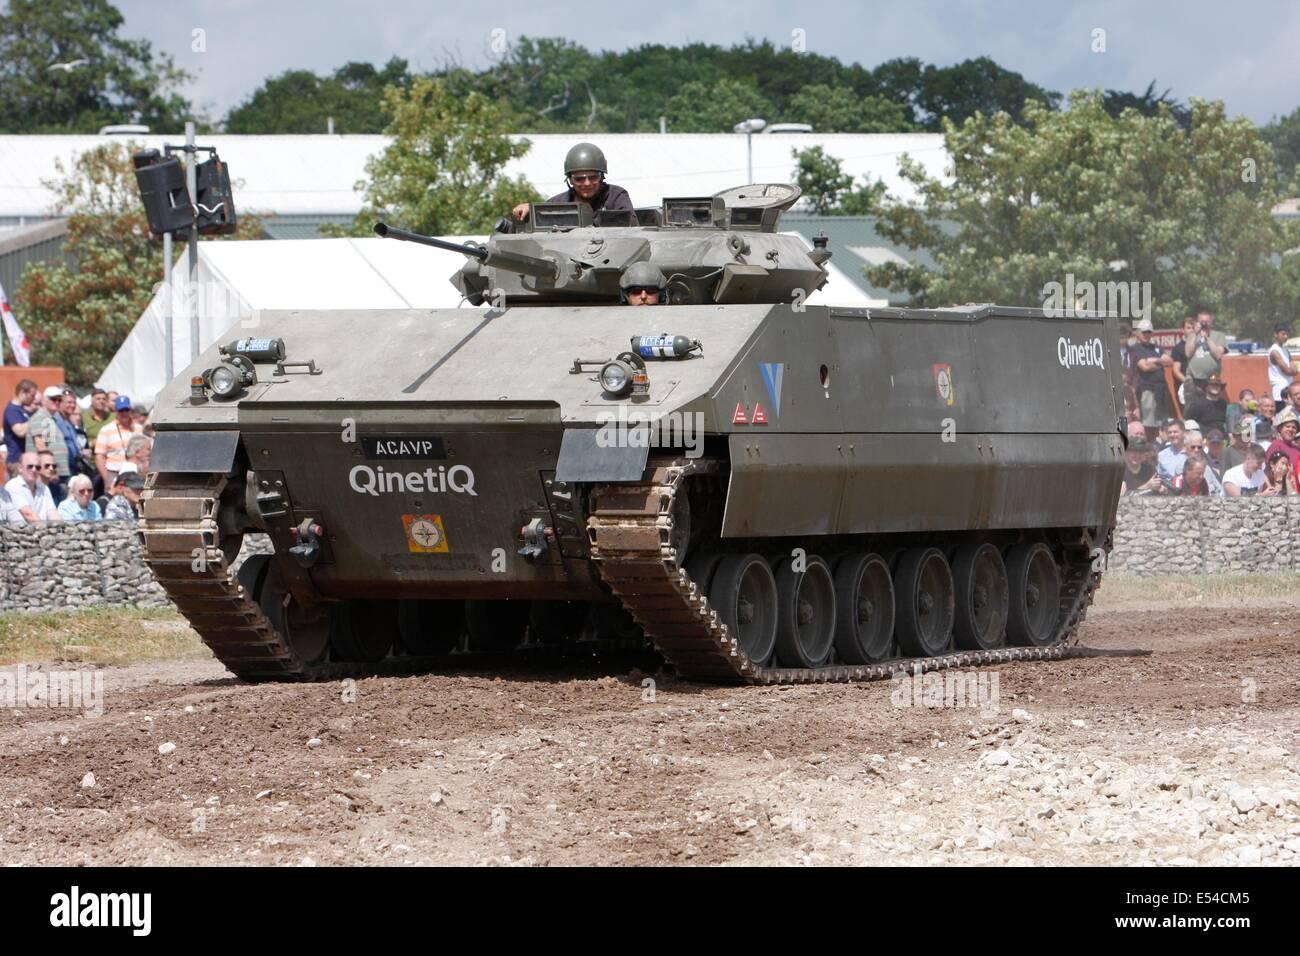 ACAVP Plastic Tank QinetiQ - Bovington Tankfest 2014 - Stock Image